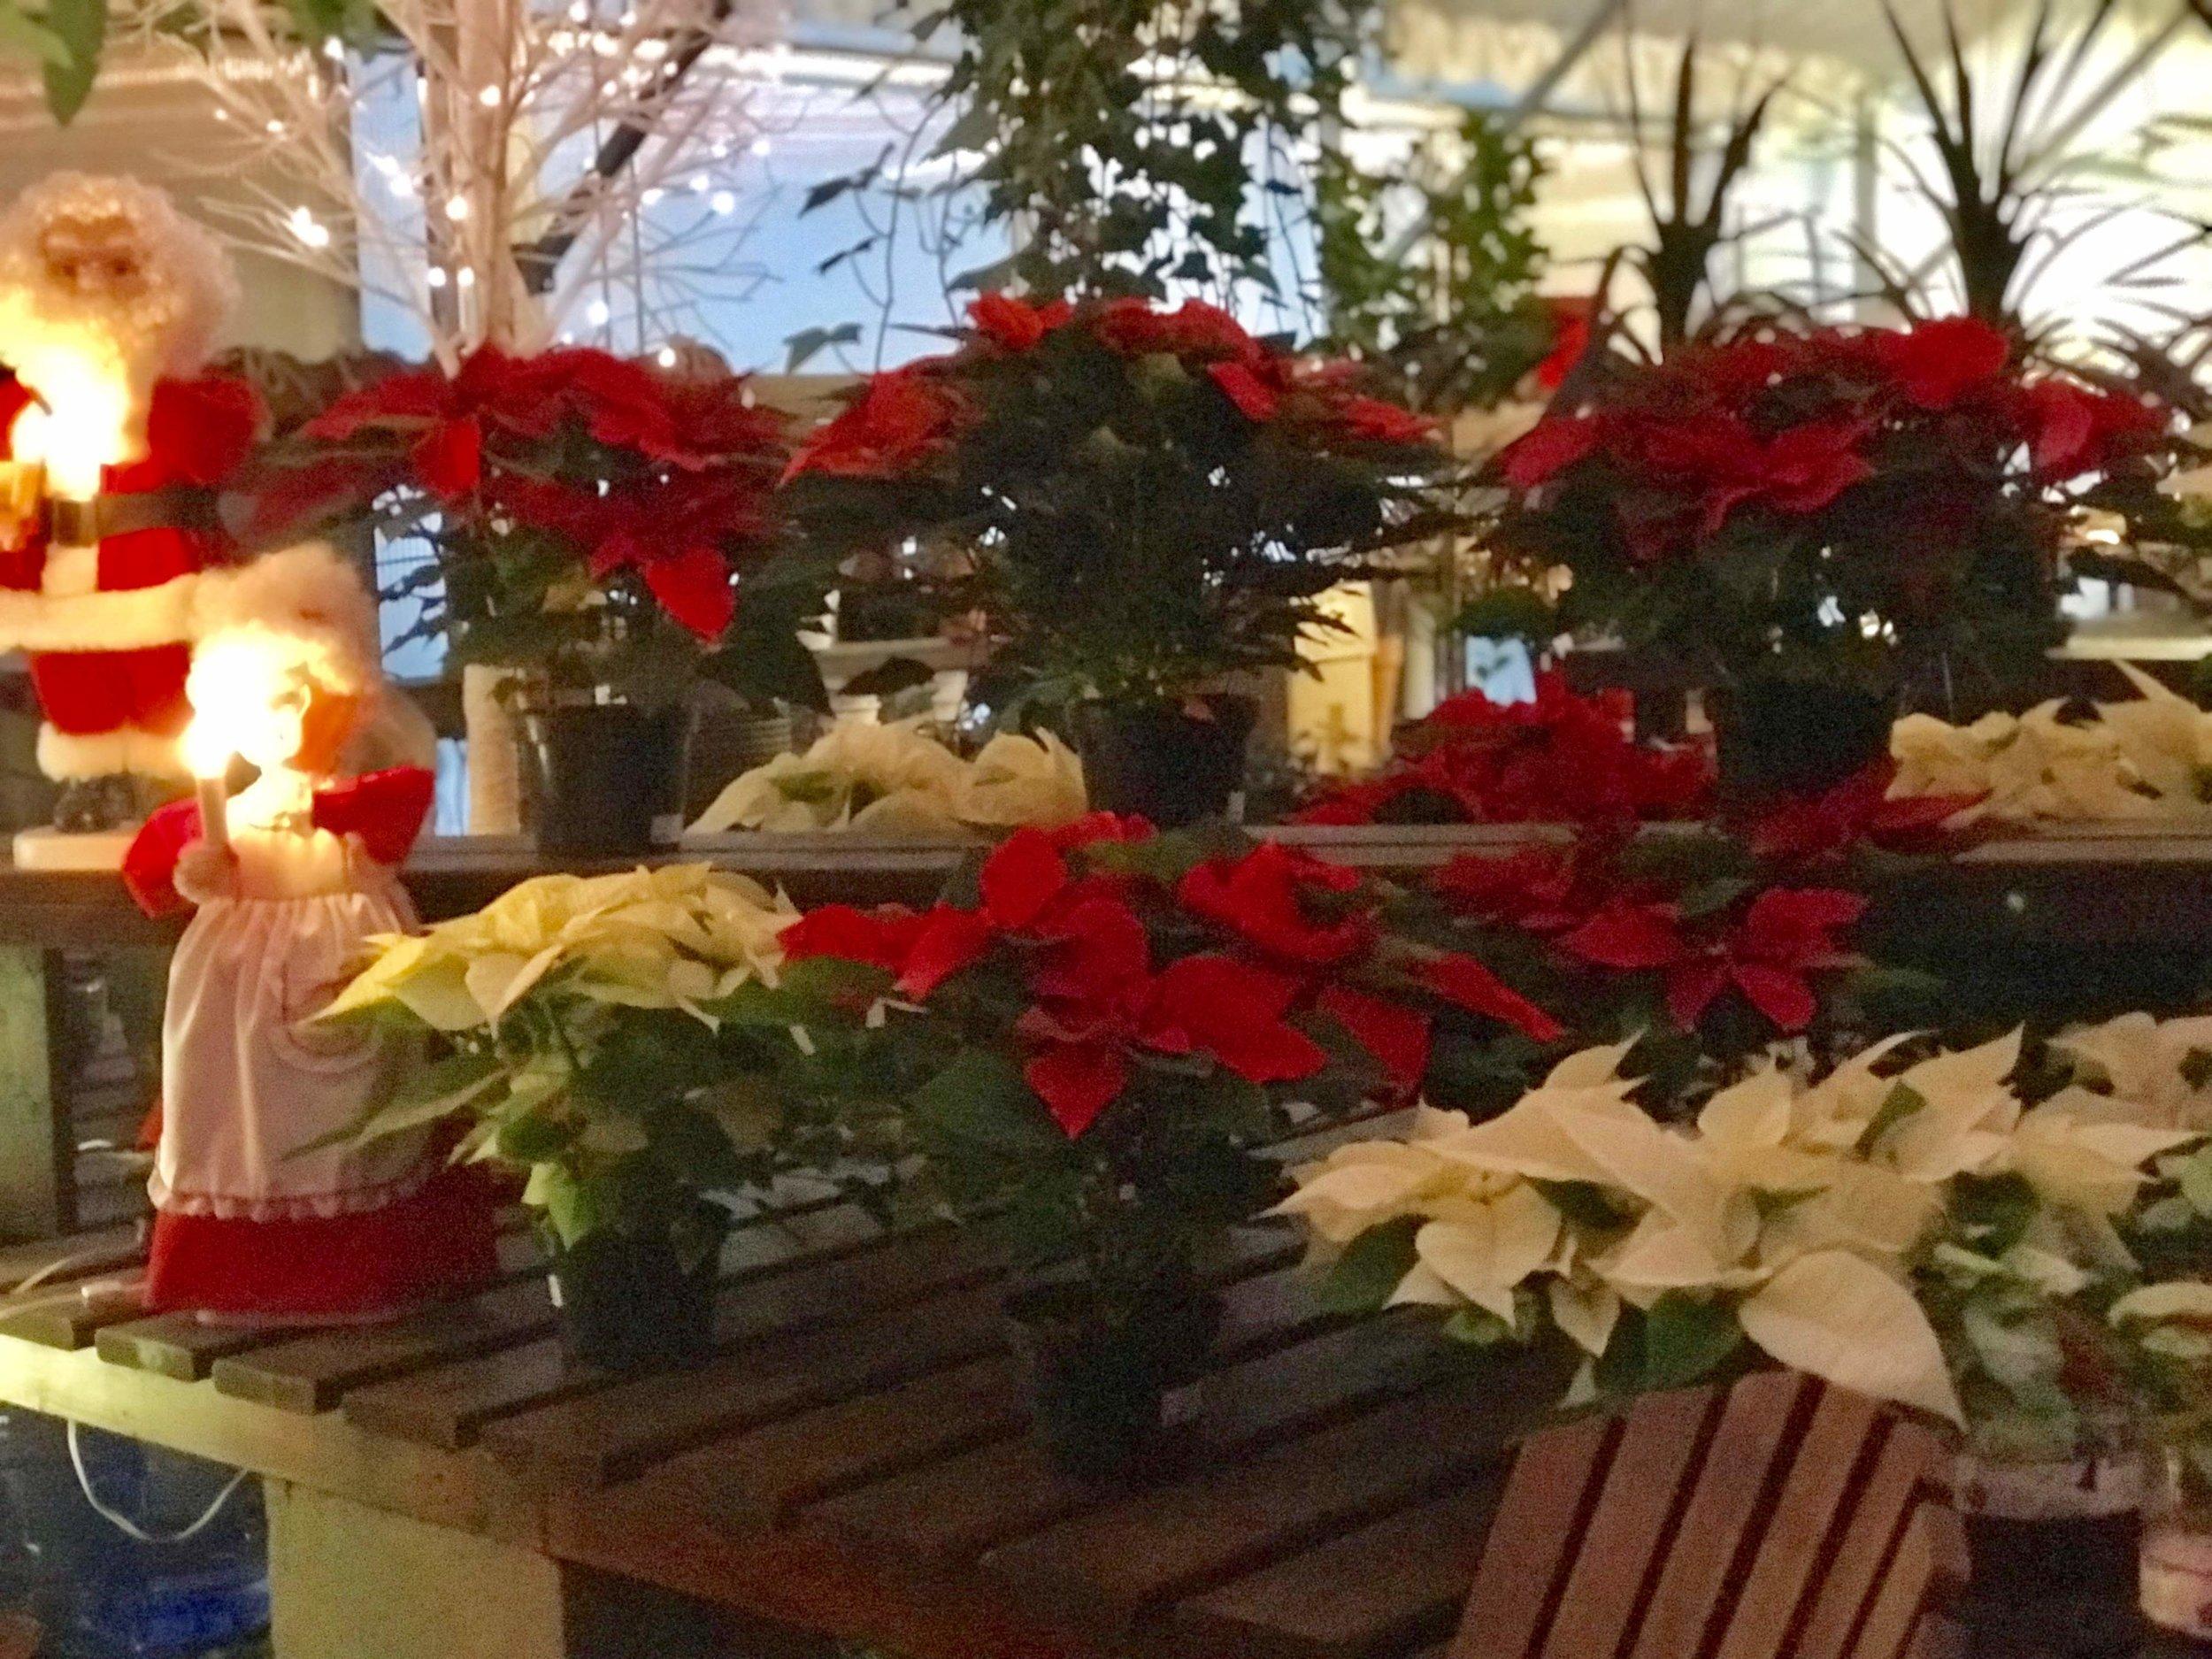 Poinsettias at Christmas